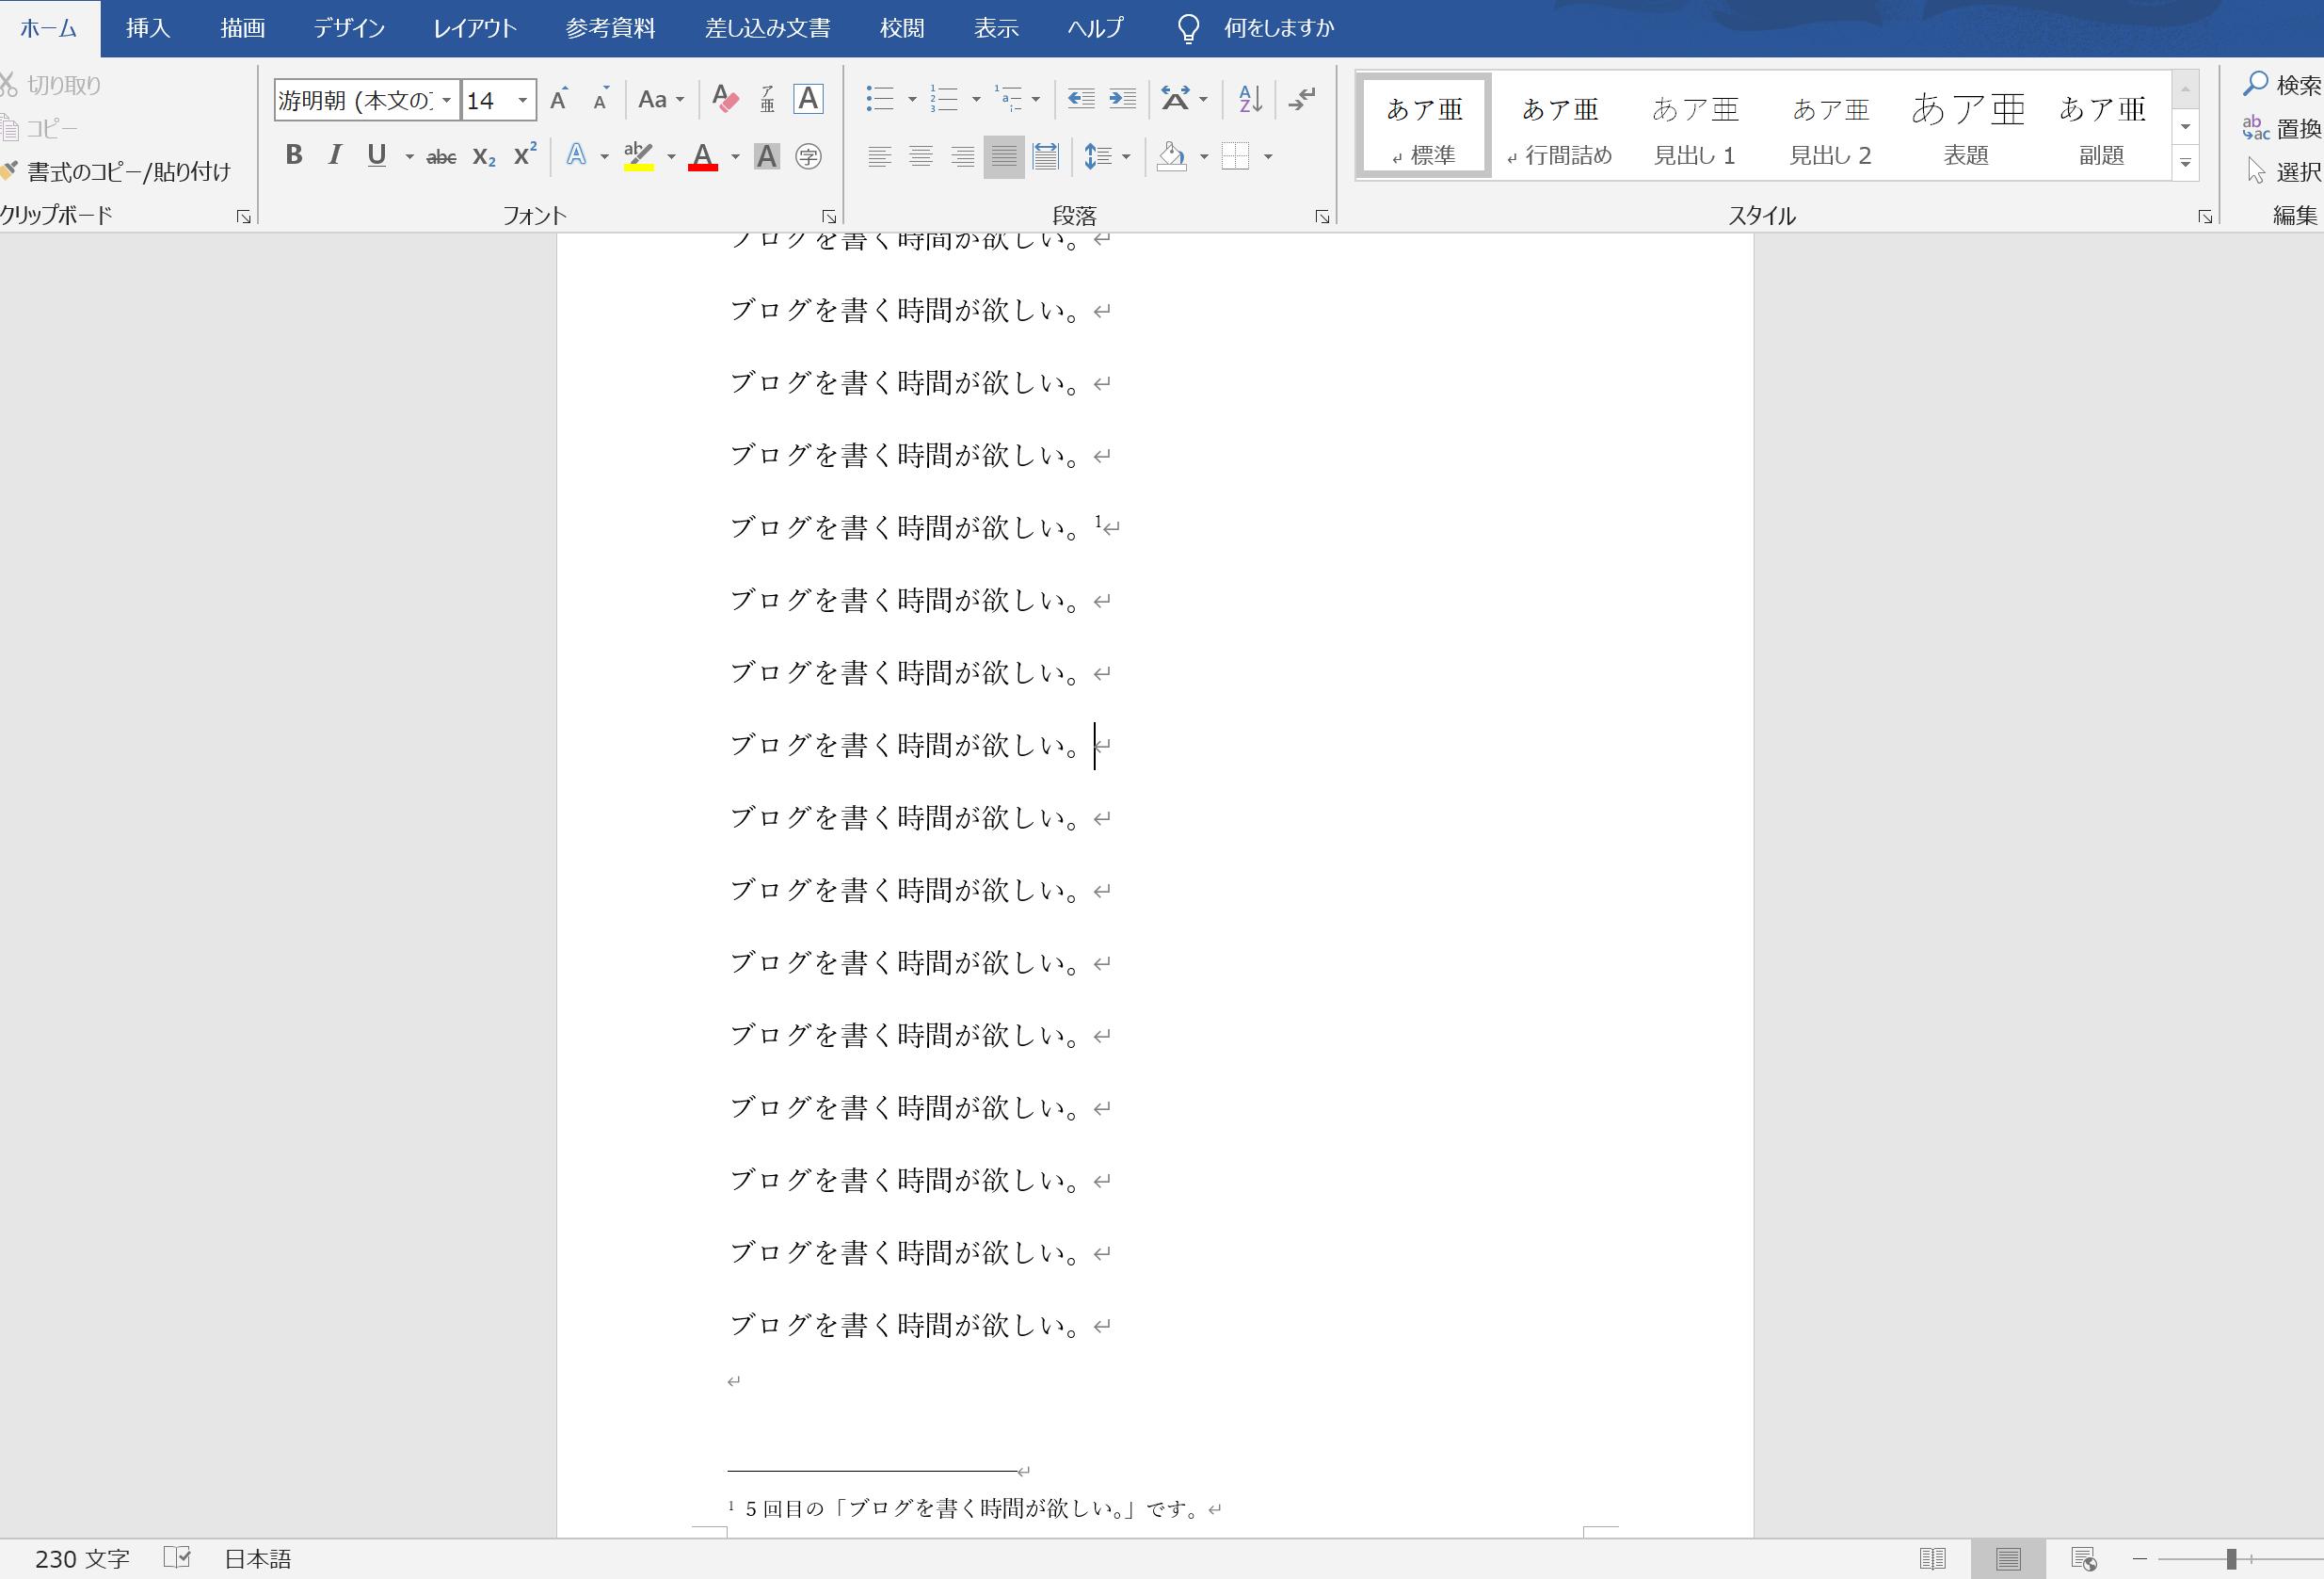 【word】word文書の欄外に注釈を入れる方法、境界線を消す方法を解説します